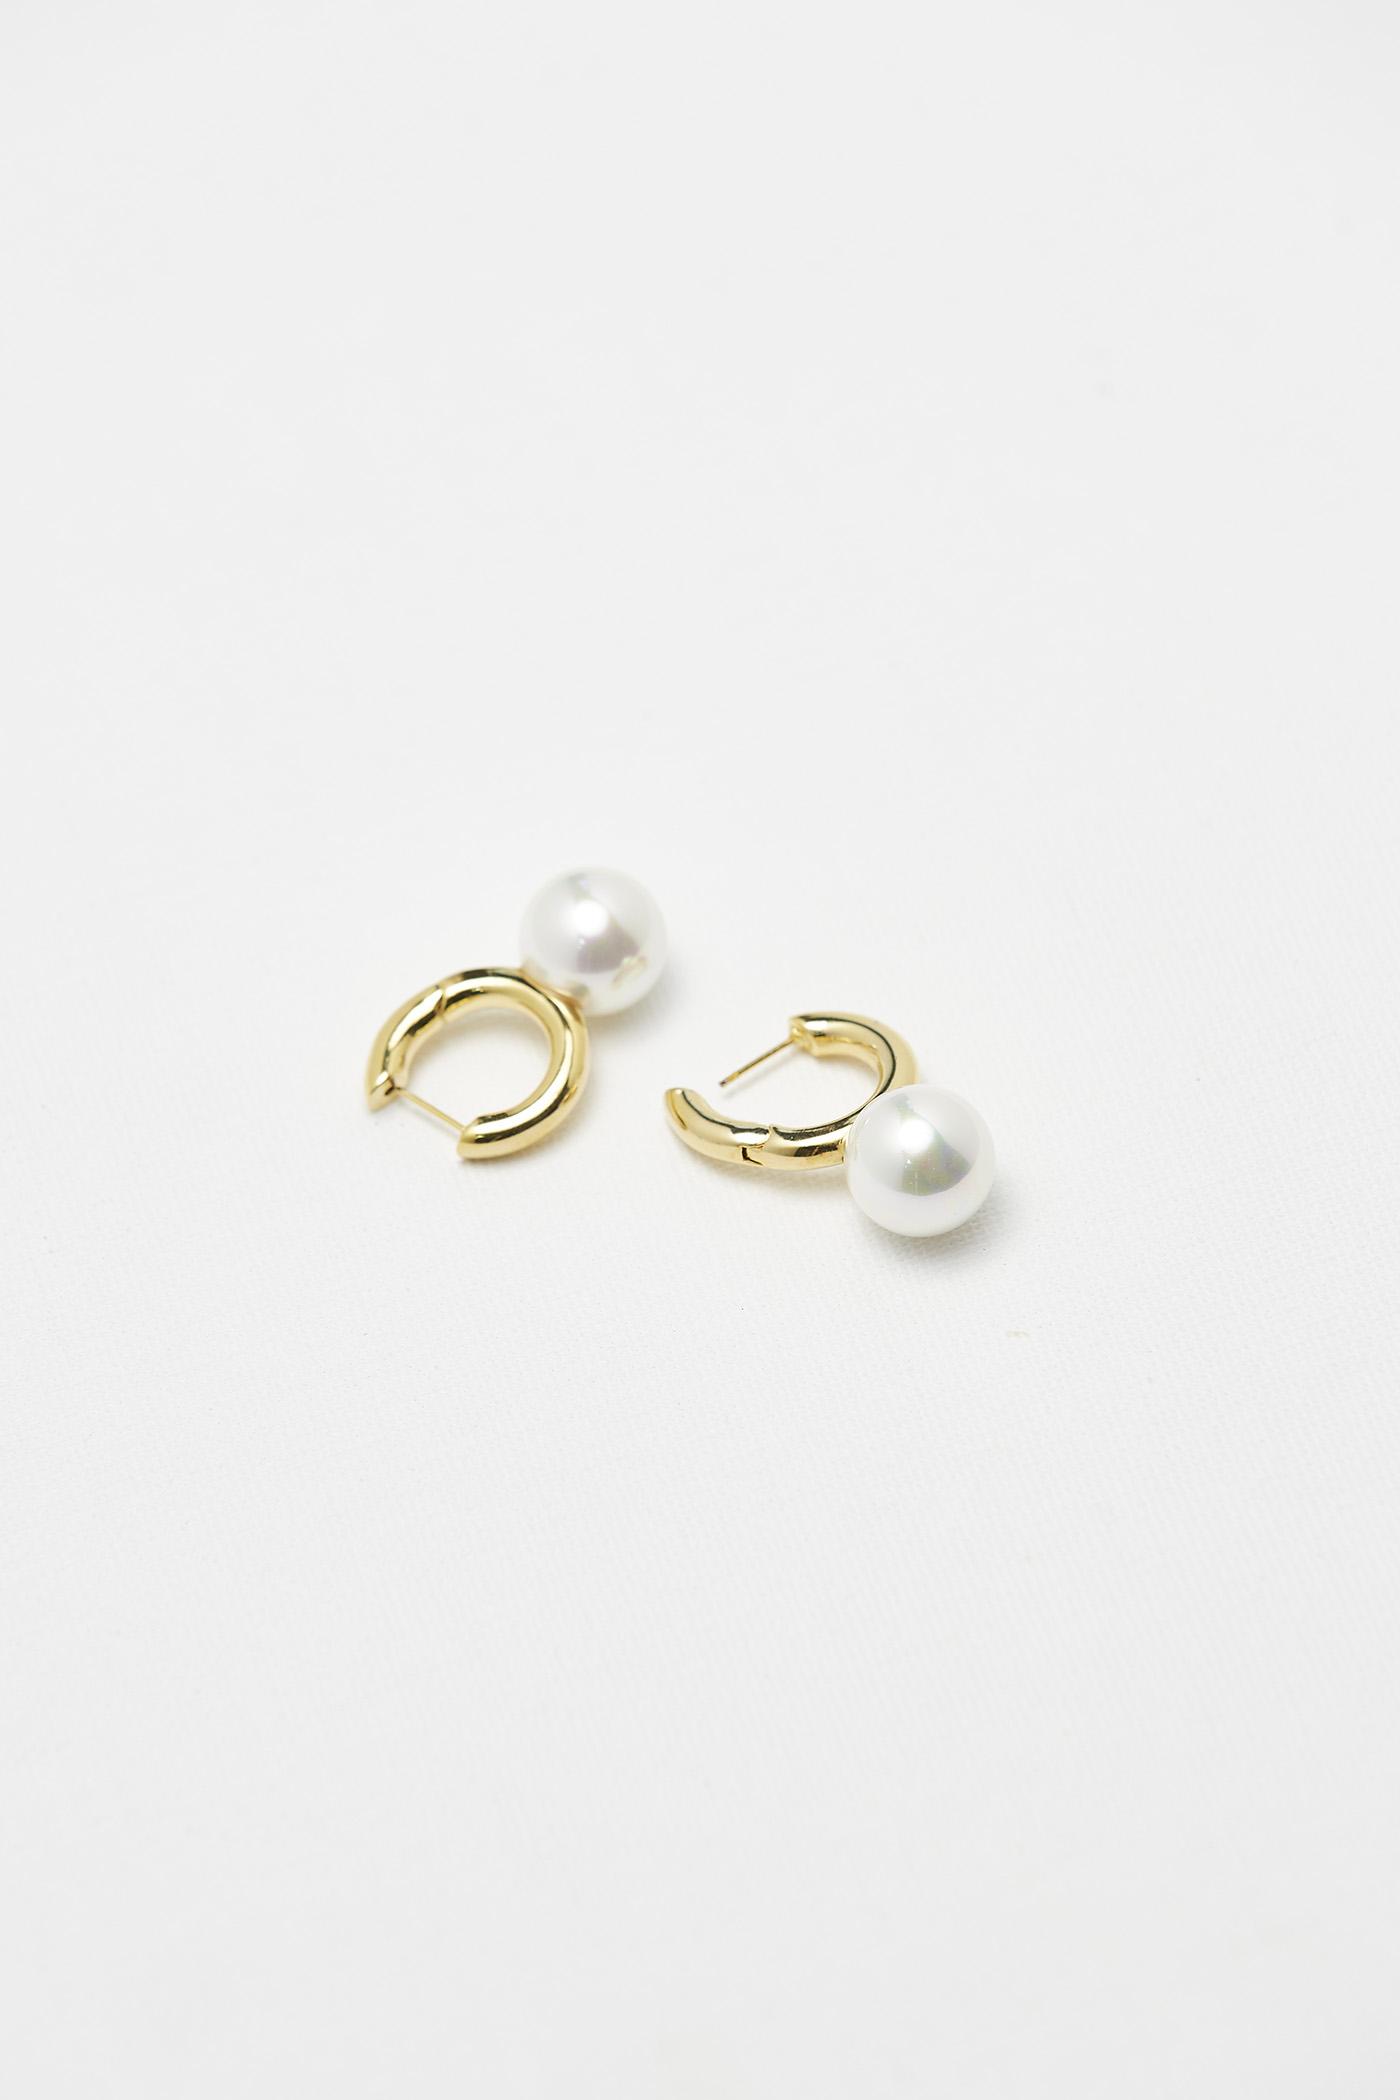 Yulla Earrings